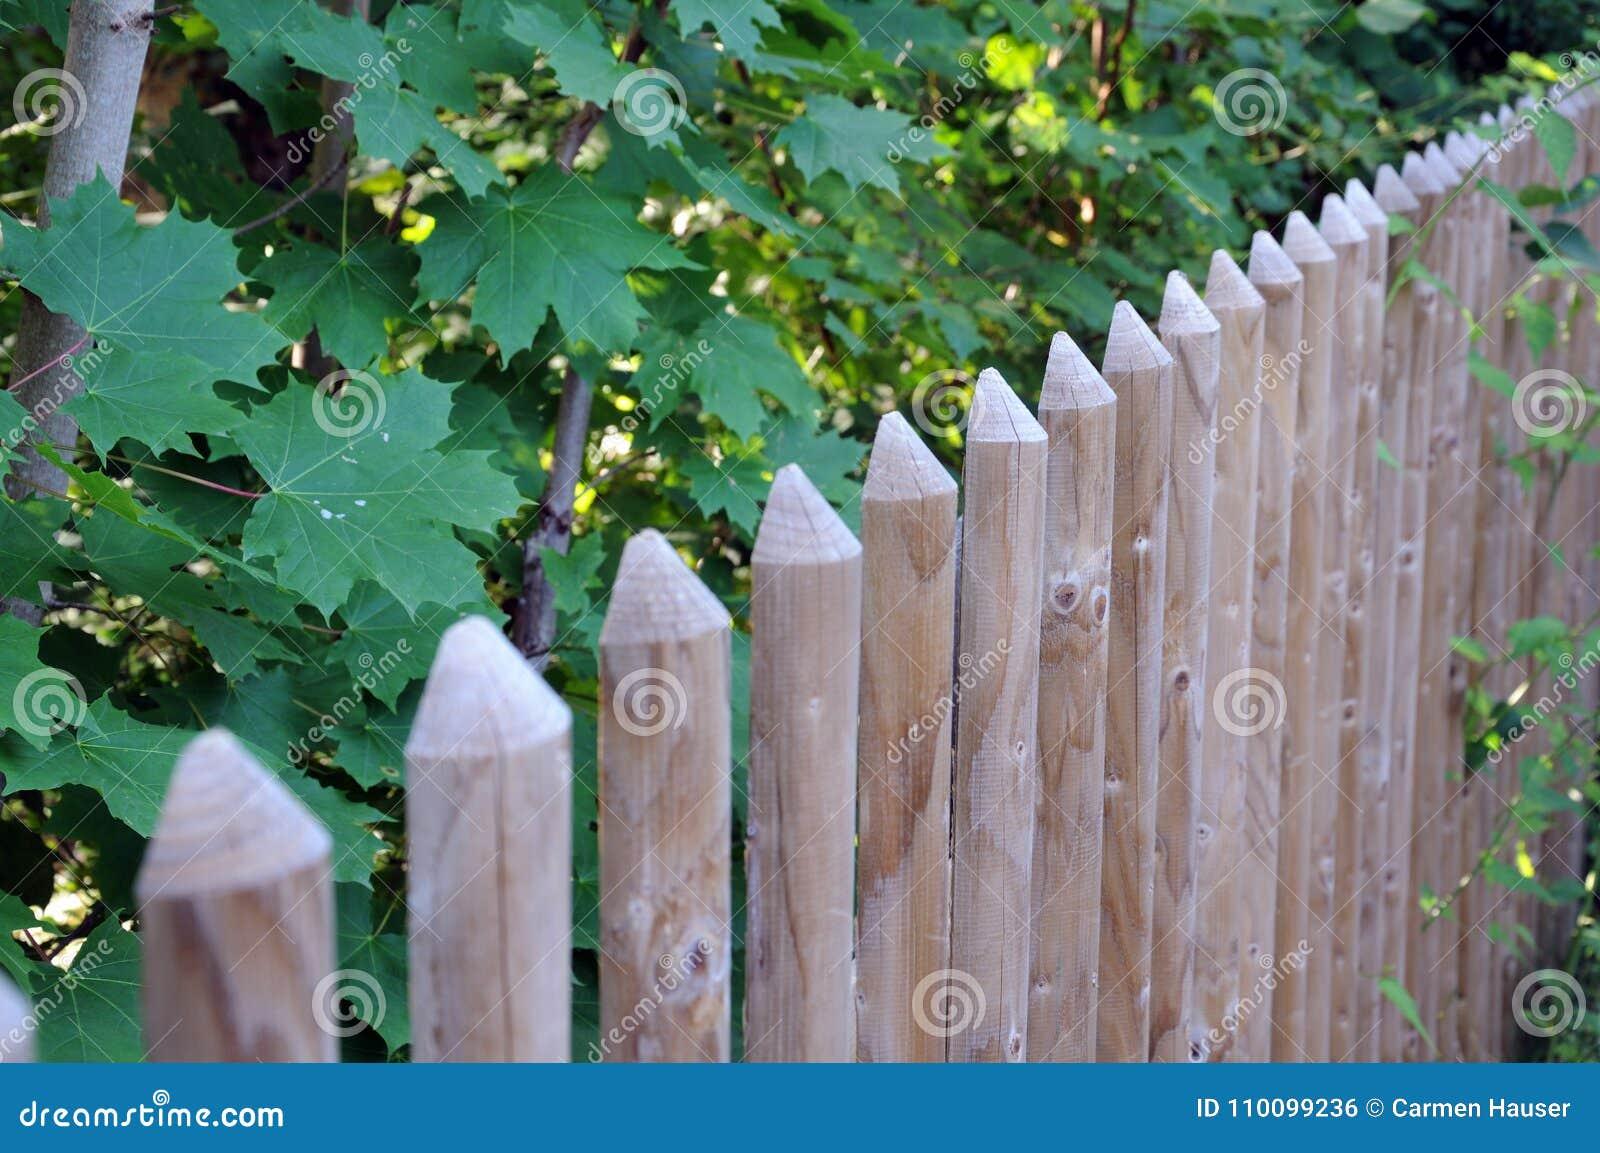 Stockade Fence With Half Round Posts Stock Photo Image